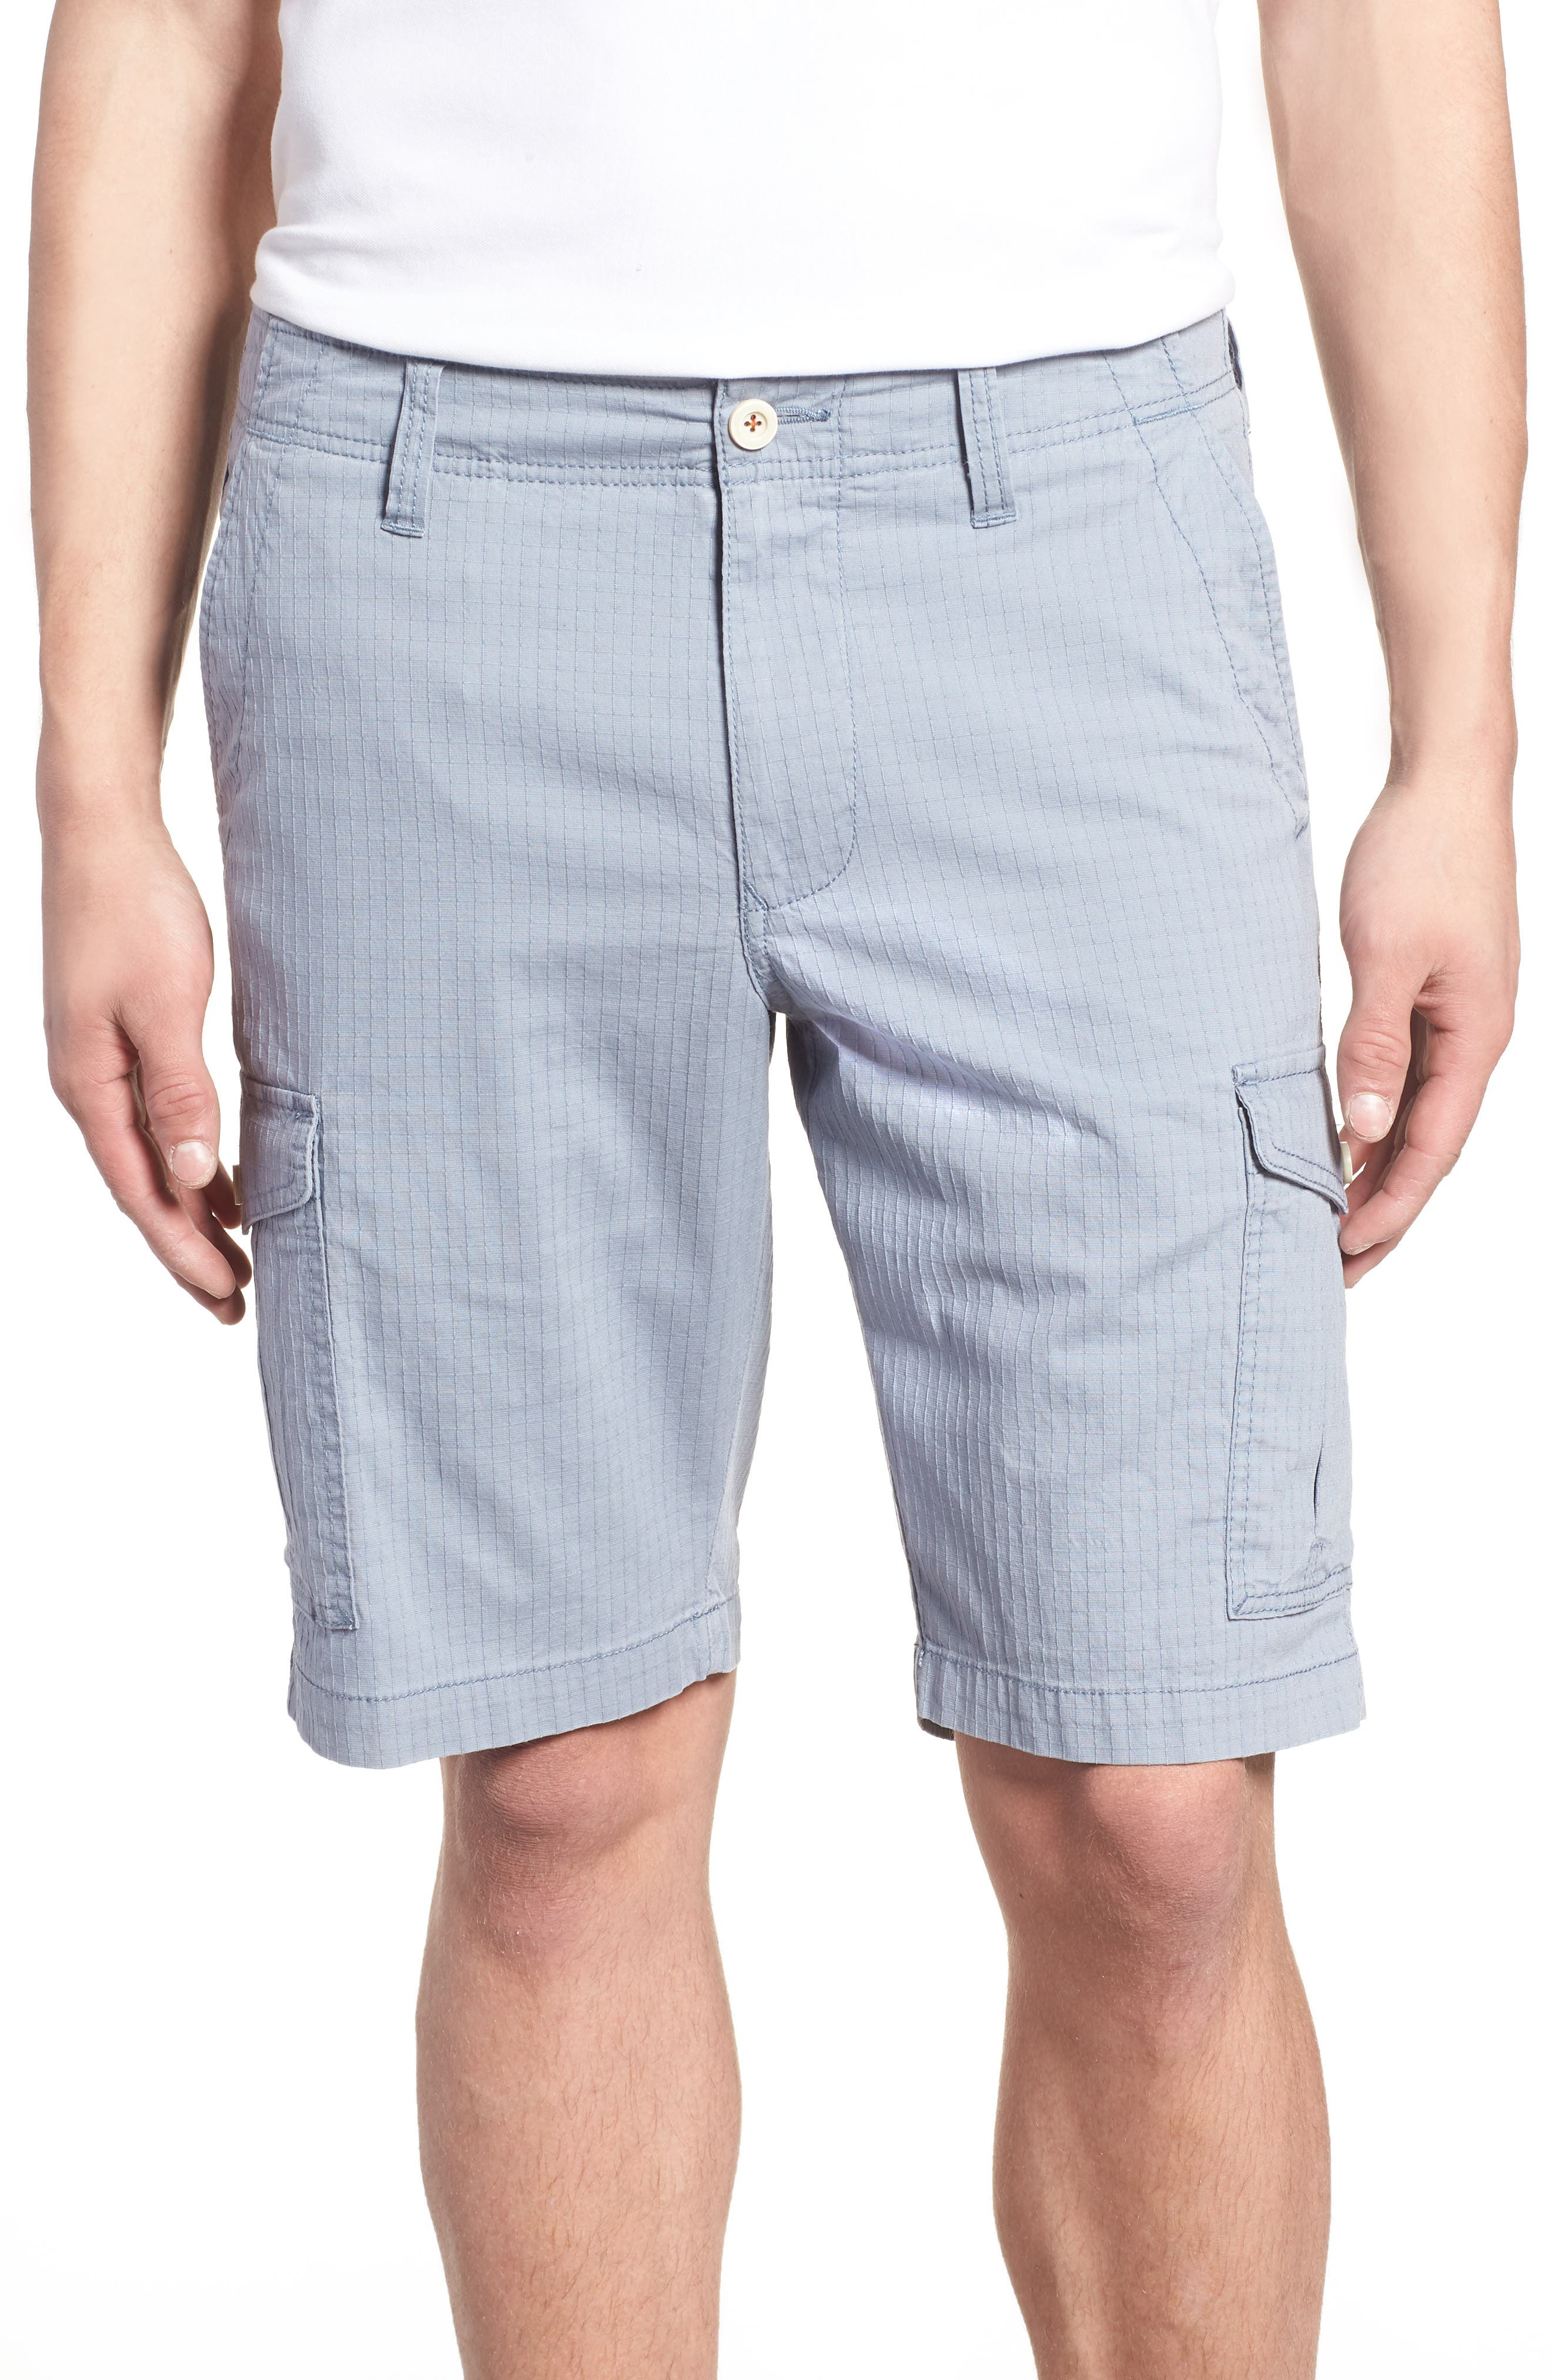 Sandbar Ripstop Cargo Shorts,                             Main thumbnail 1, color,                             401